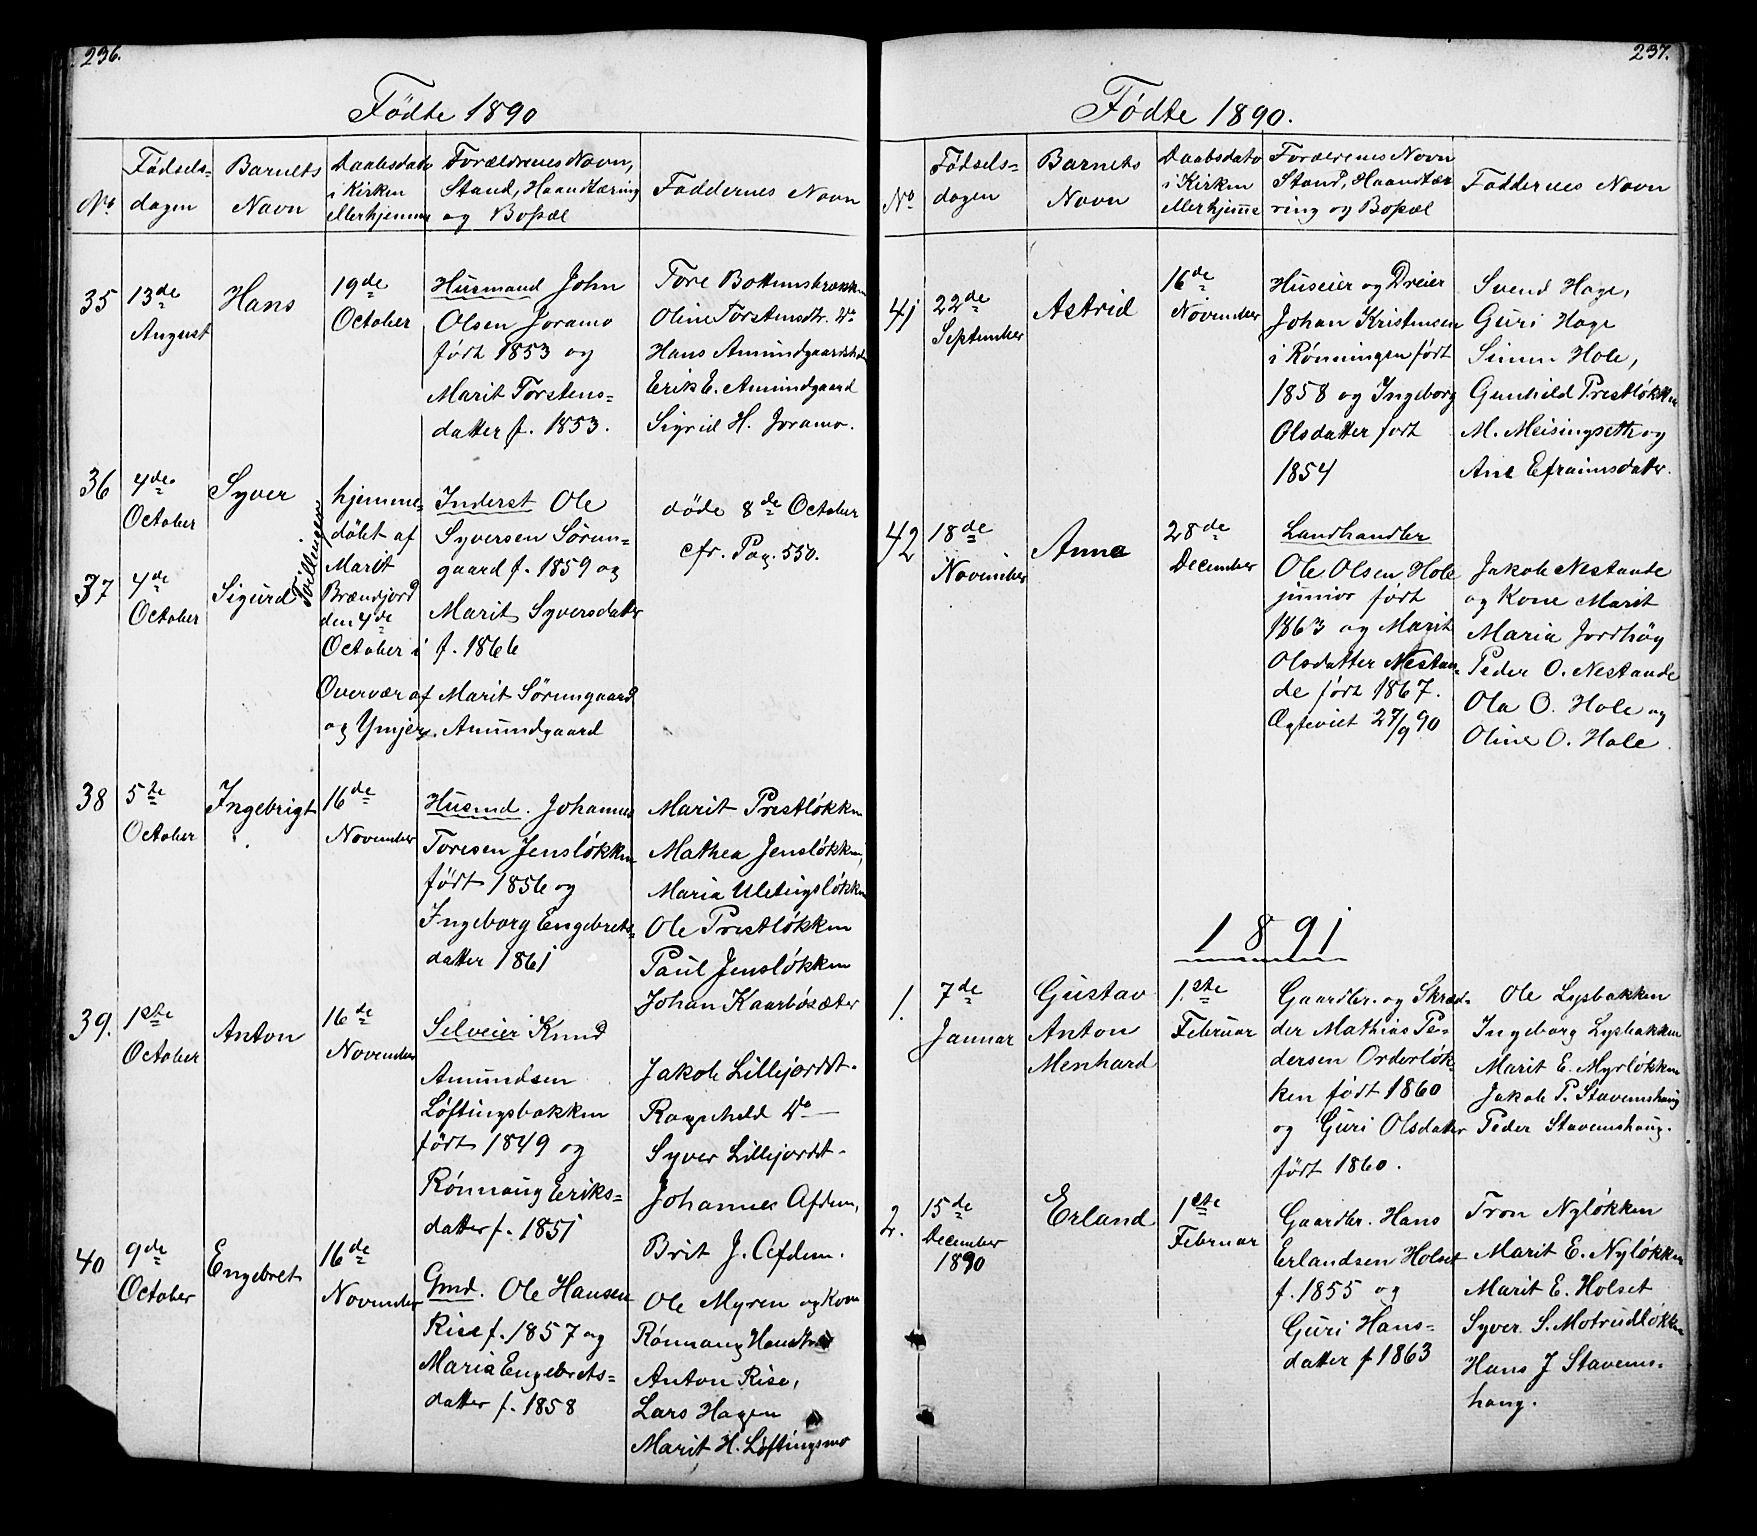 SAH, Lesja prestekontor, Klokkerbok nr. 5, 1850-1894, s. 236-237